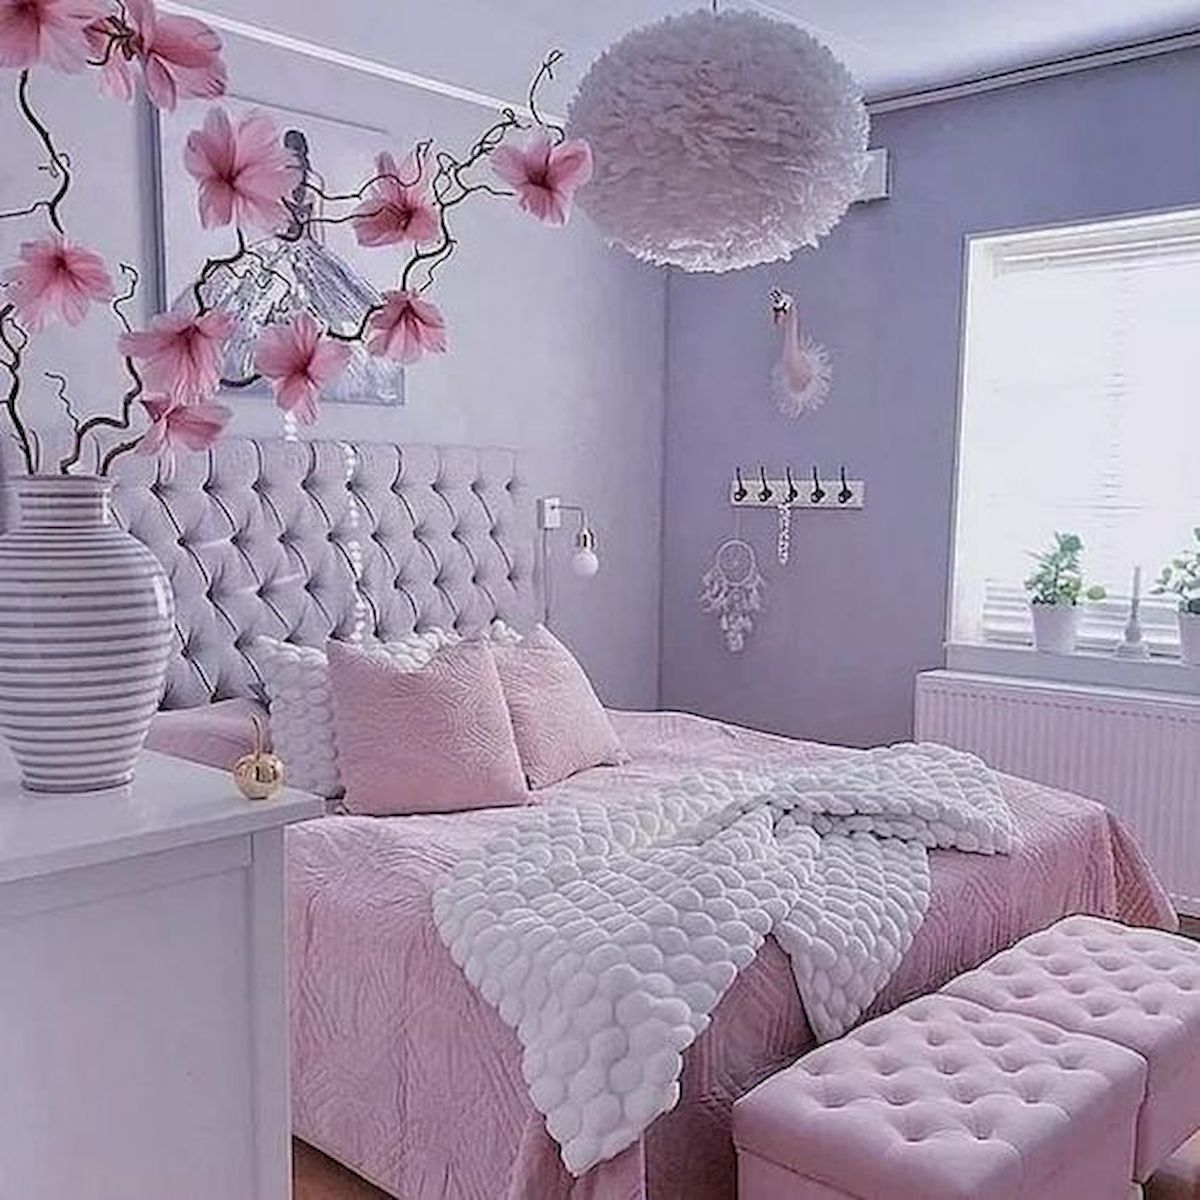 60 Cute Bedroom Design And Decor Ideas For Kids Girly Bedroom Bedroom Decorating Tips Pink Bedroom Design